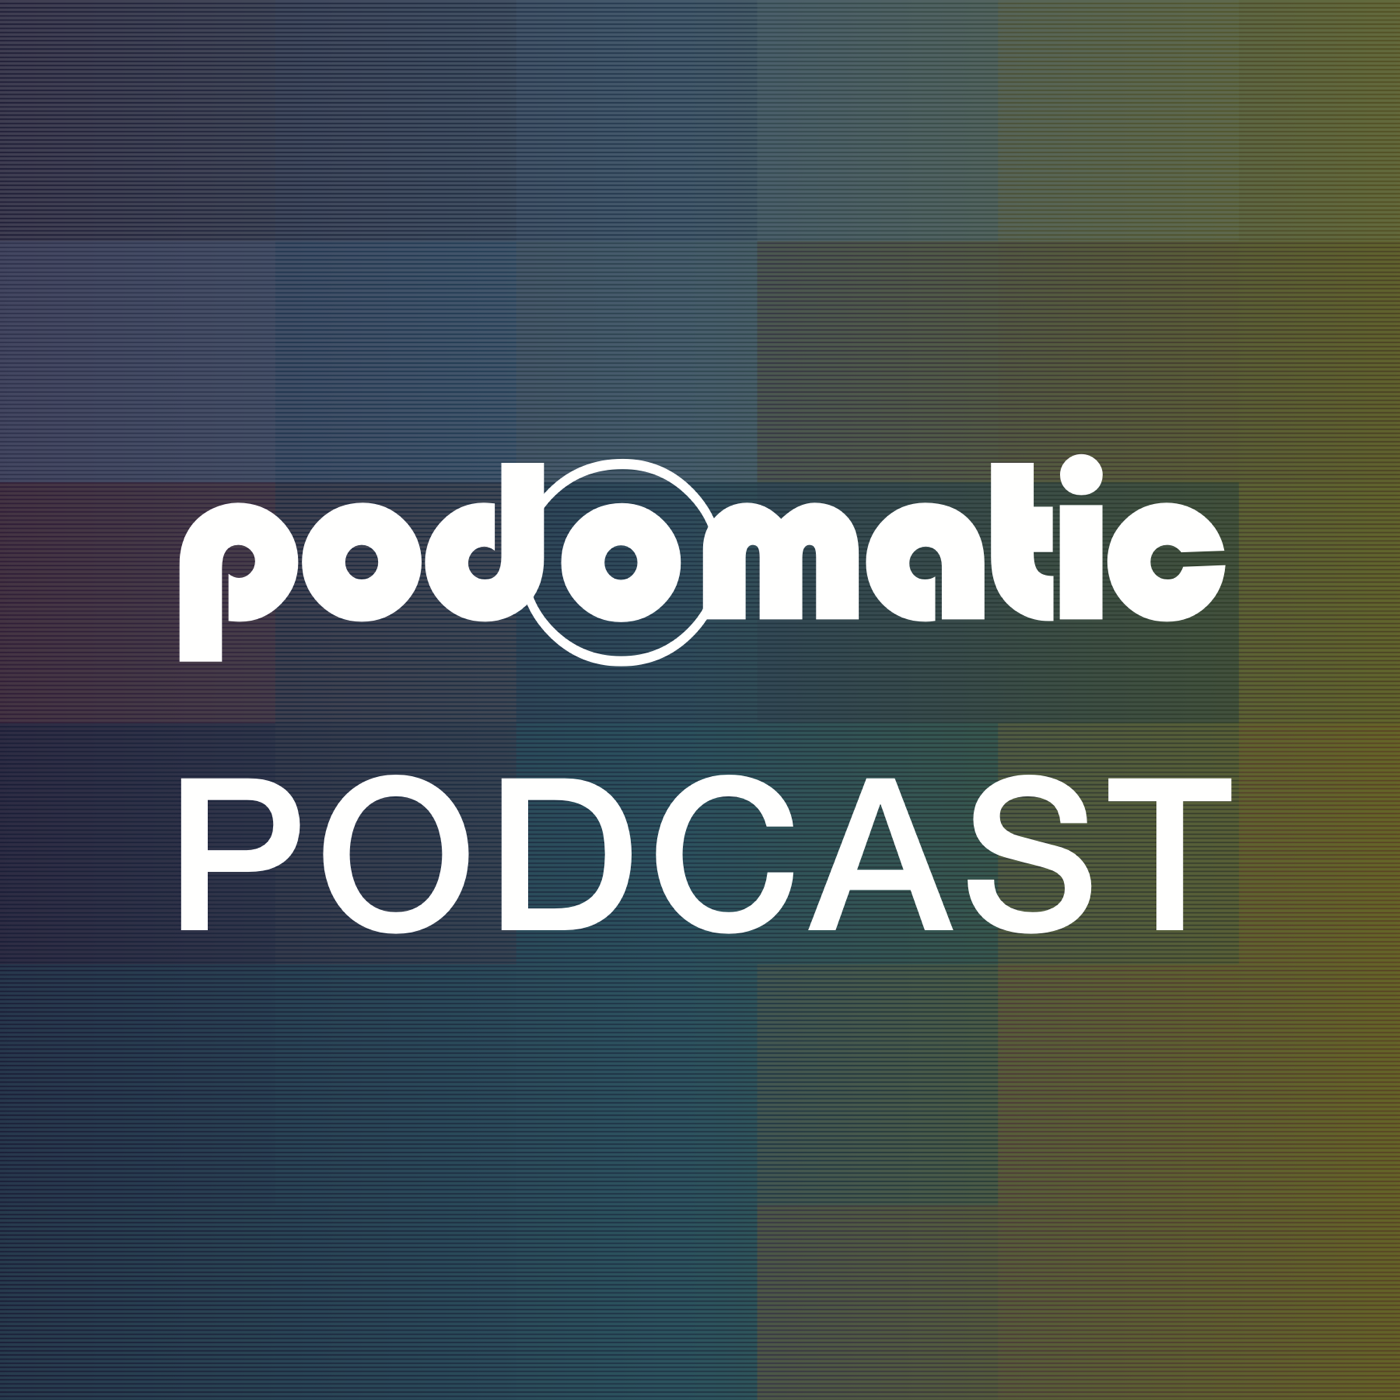 sonikmovement's Podcast